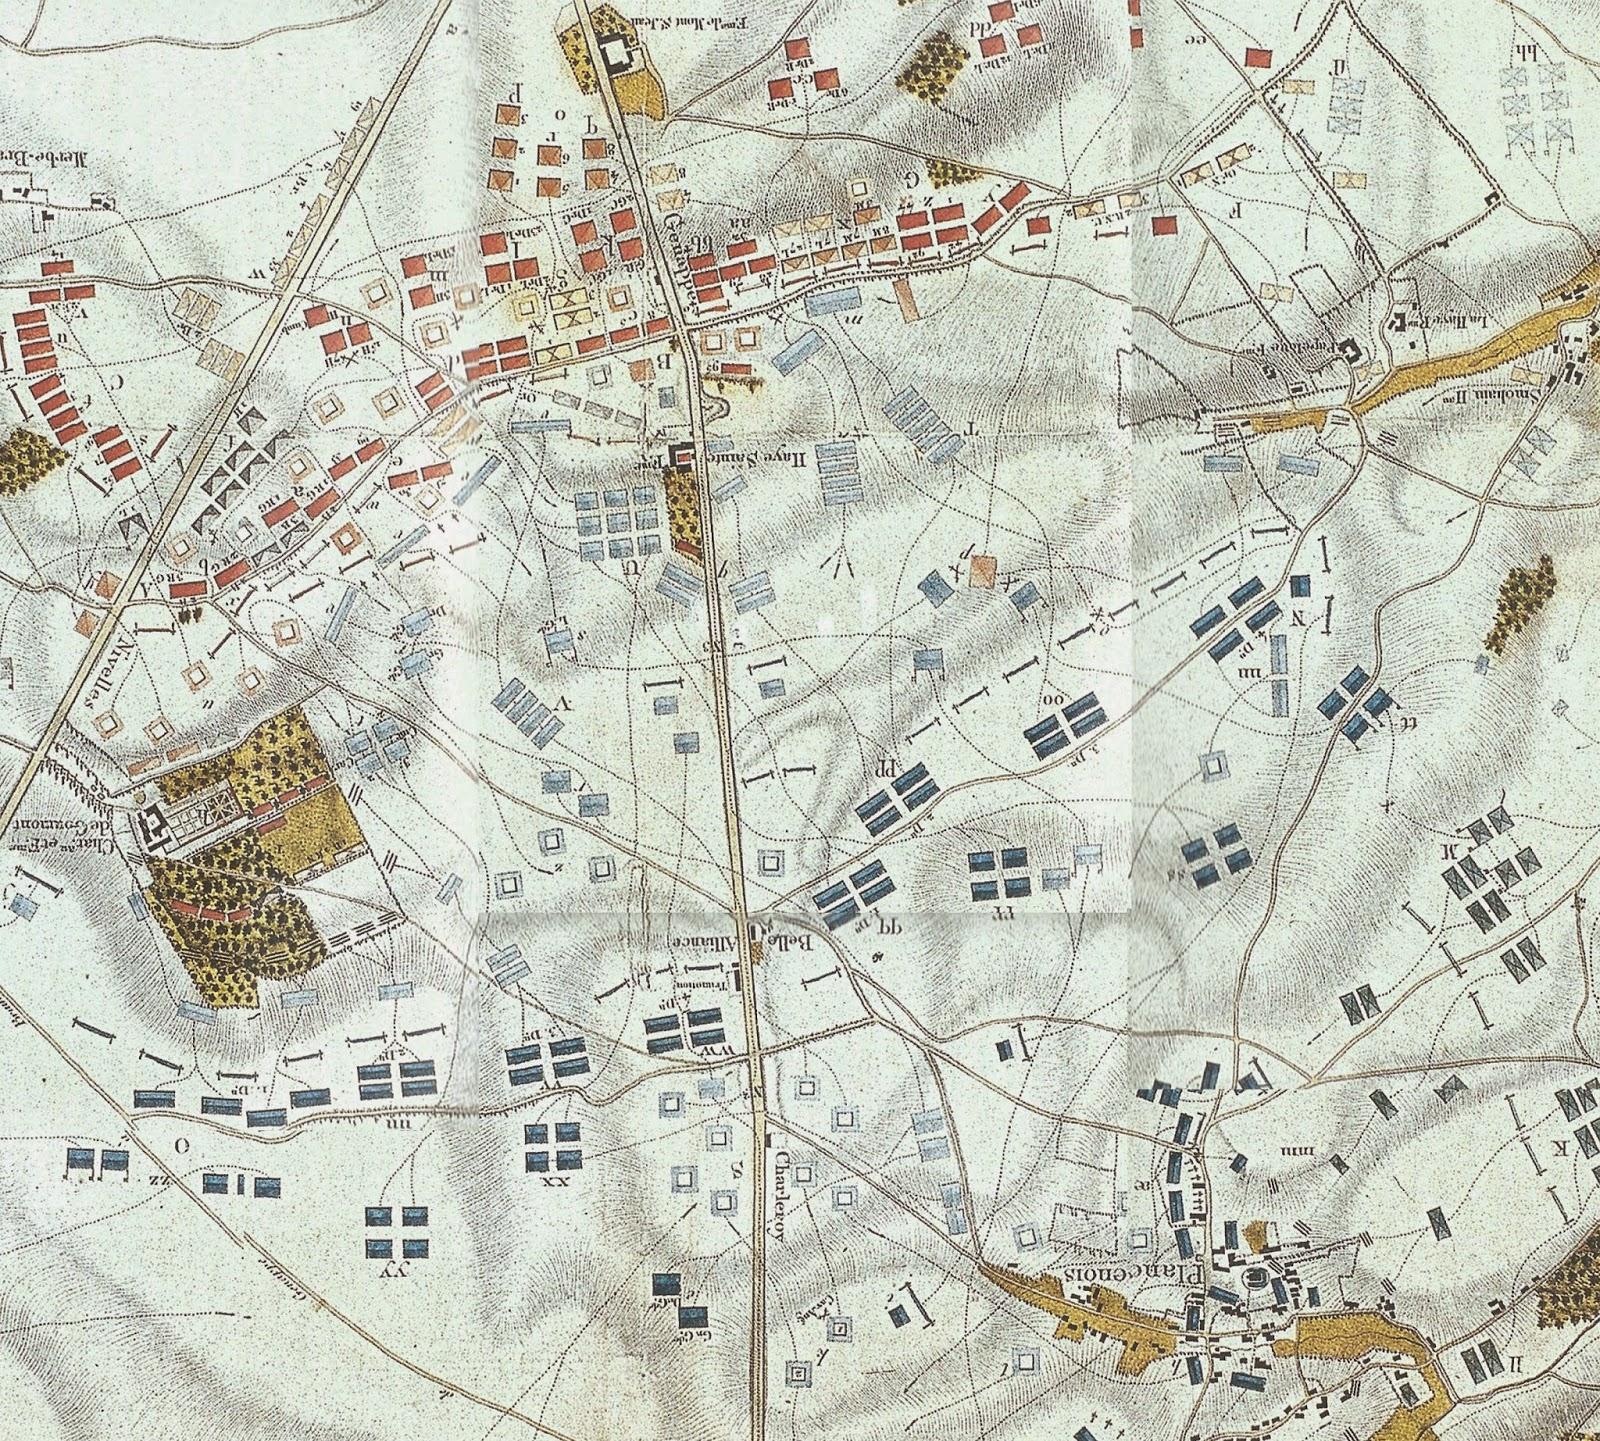 Map of Waterloo Battlefield by Craan